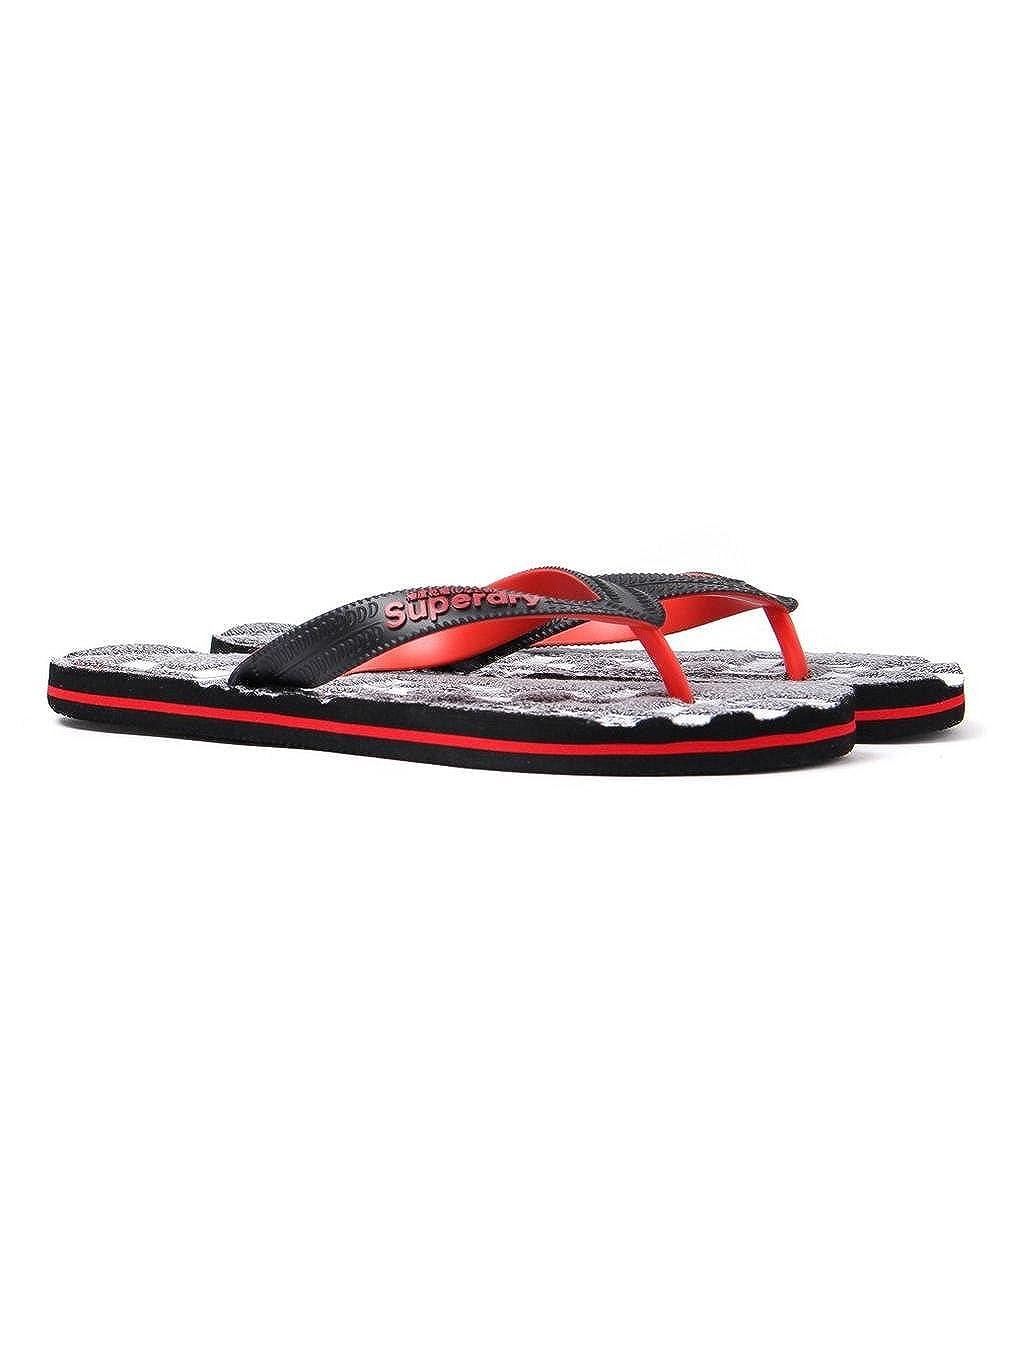 3ae700fd5c7c3 Superdry Scuba Marl Flip Flop  Amazon.co.uk  Sports   Outdoors